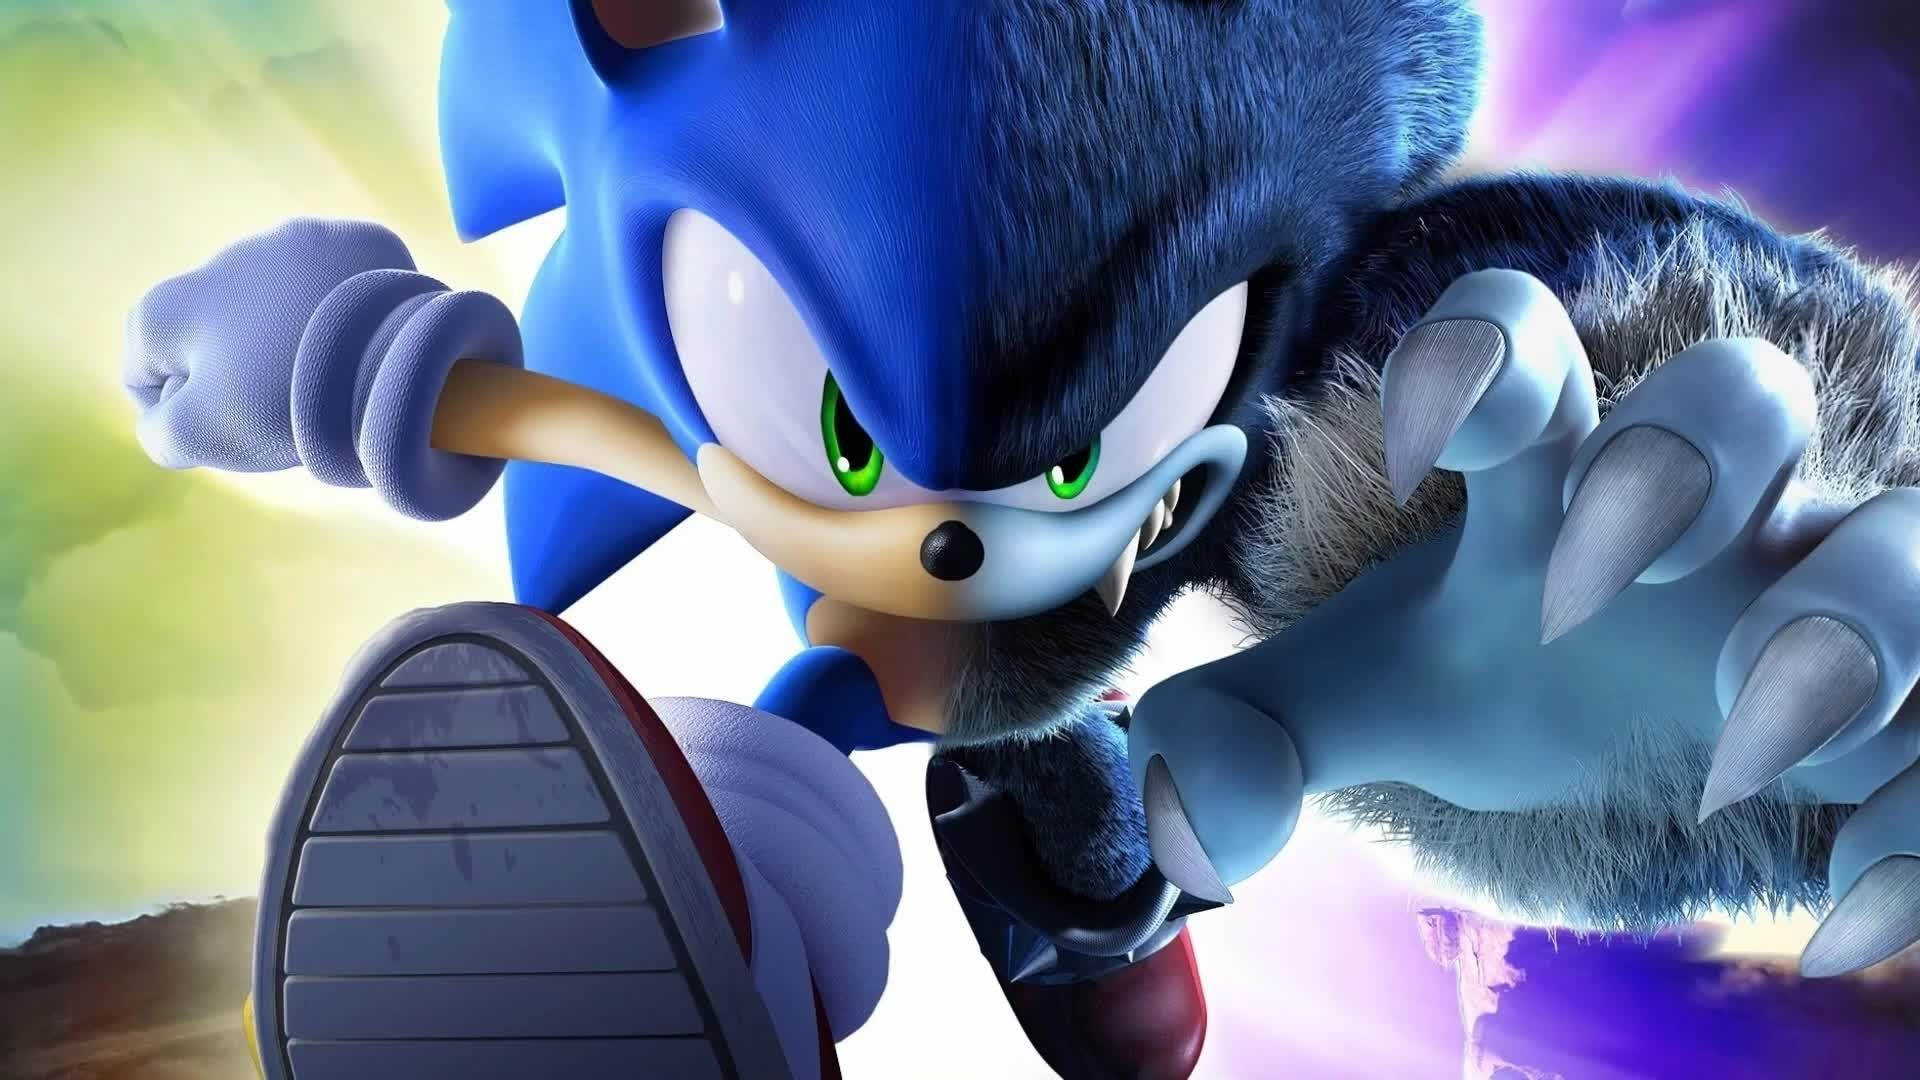 Sonic The Hedgehog Live Wallpaper Desktophut Inside Sonic Wallpapers Windows 10 Sonic Unleashed Sonic Sonic The Hedgehog